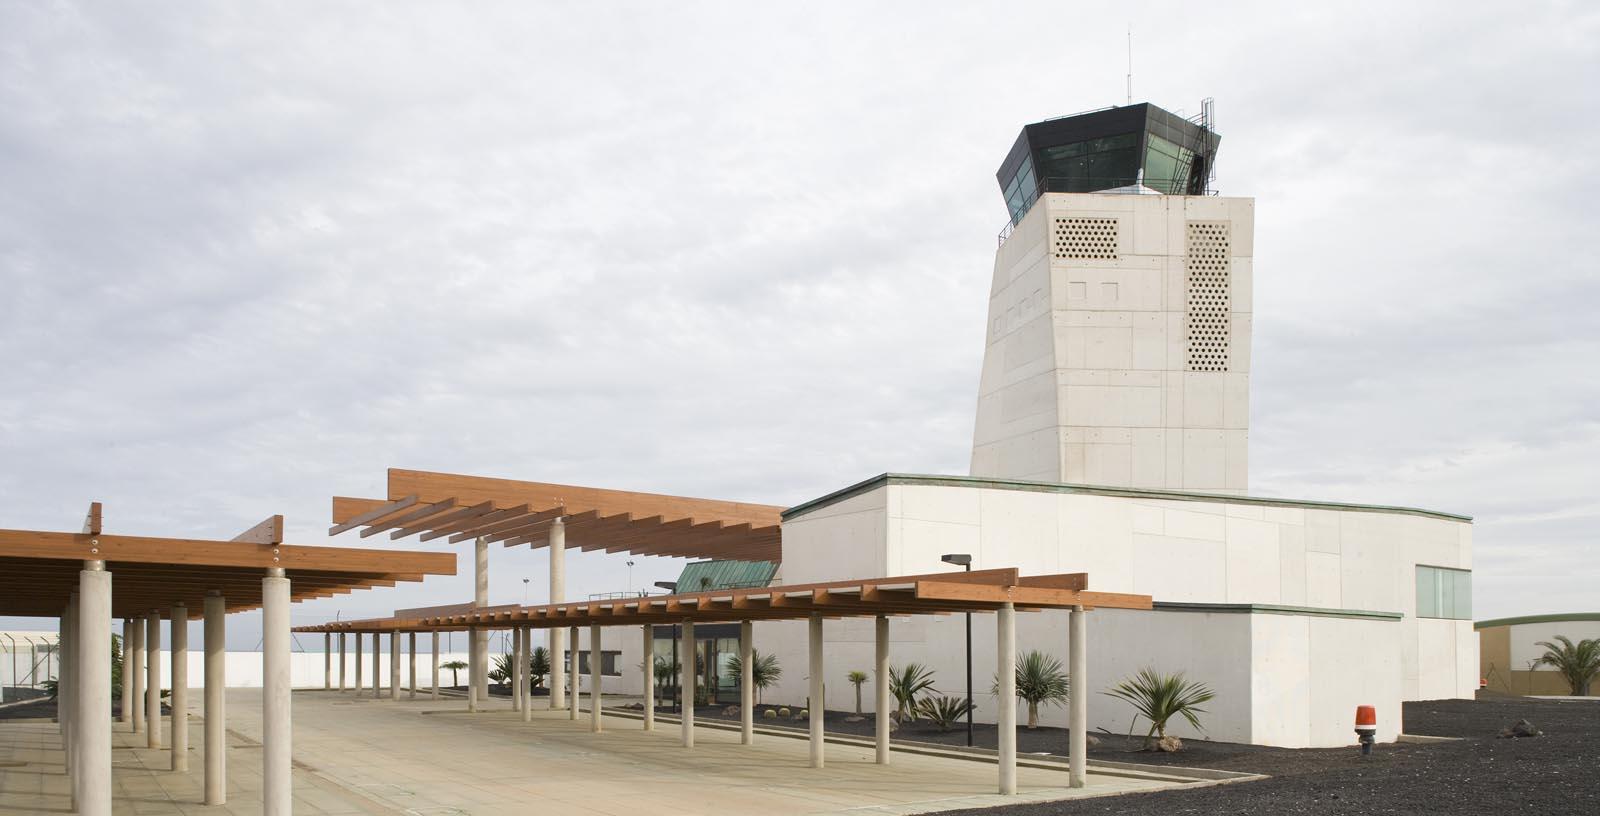 control-tower-fuerteventura-airport-02-Architecture-IDOM-copyright-Miguel_de_Guzman